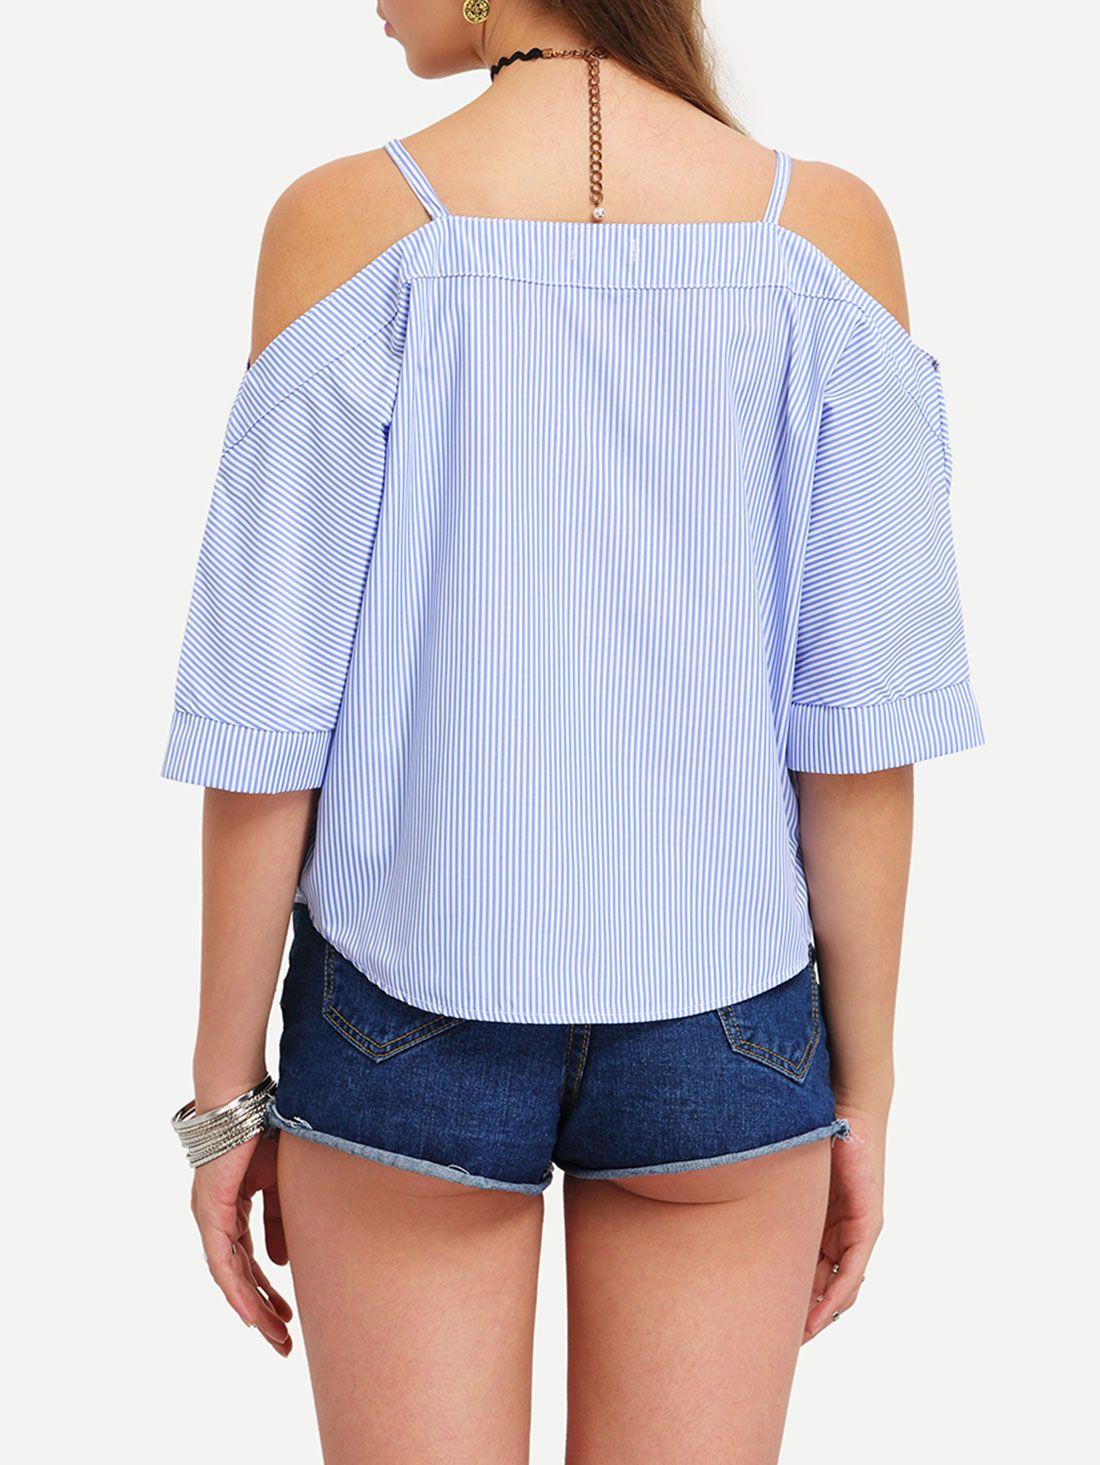 Blusa rayas verticales hombro al aire cami -Spanish SheIn(Sheinside) Sitio Móvil